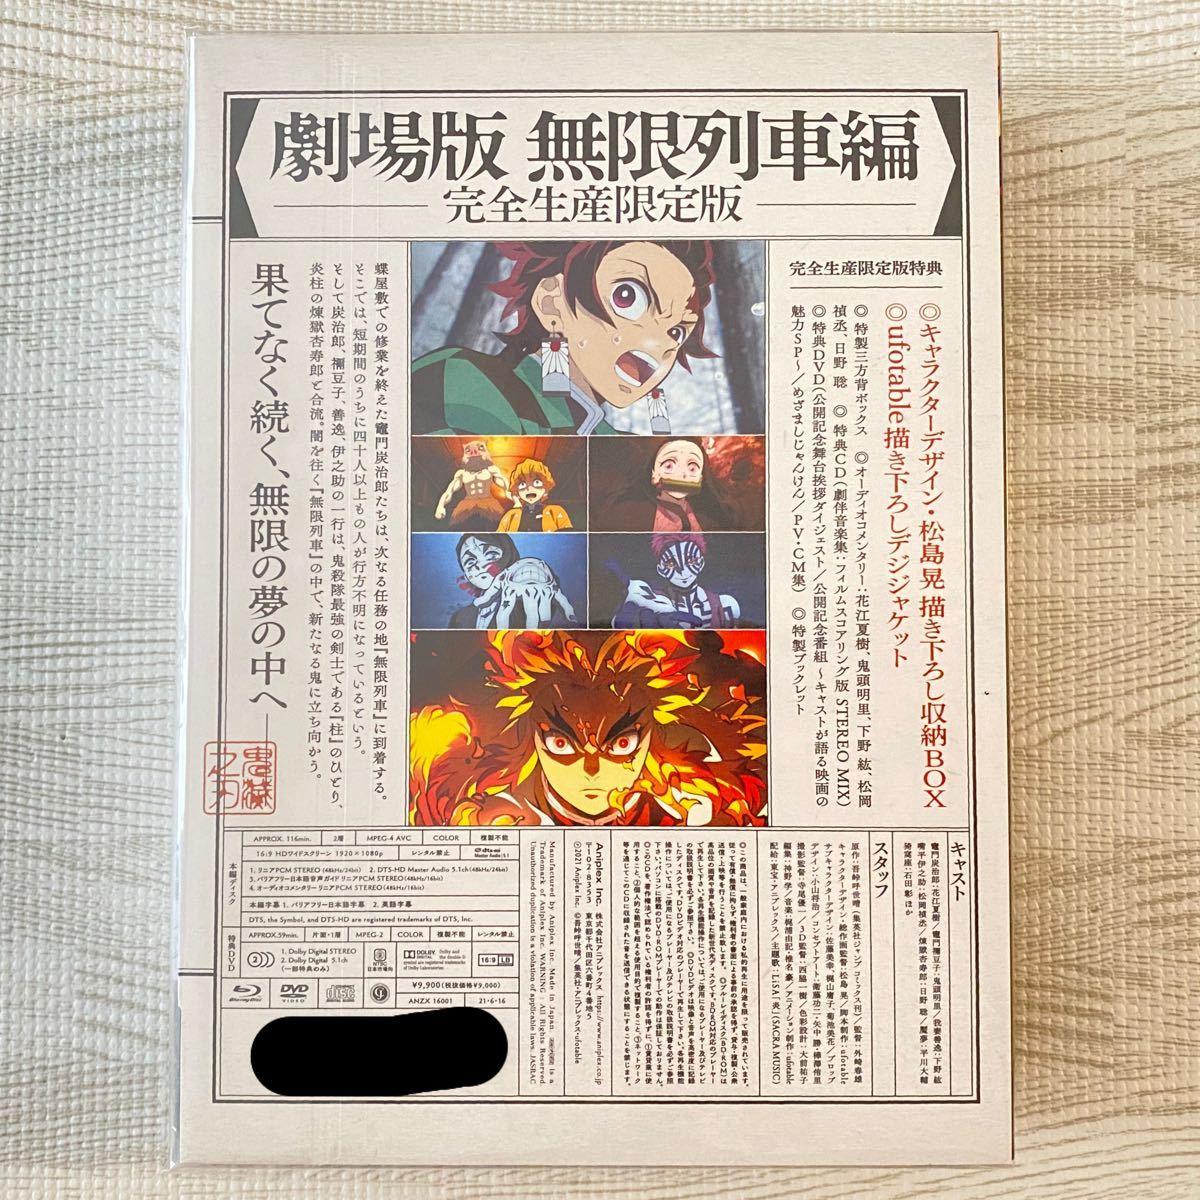 【Blu-ray】劇場版 鬼滅の刃 無限列車編 完全生産限定版 特典 色紙 付き